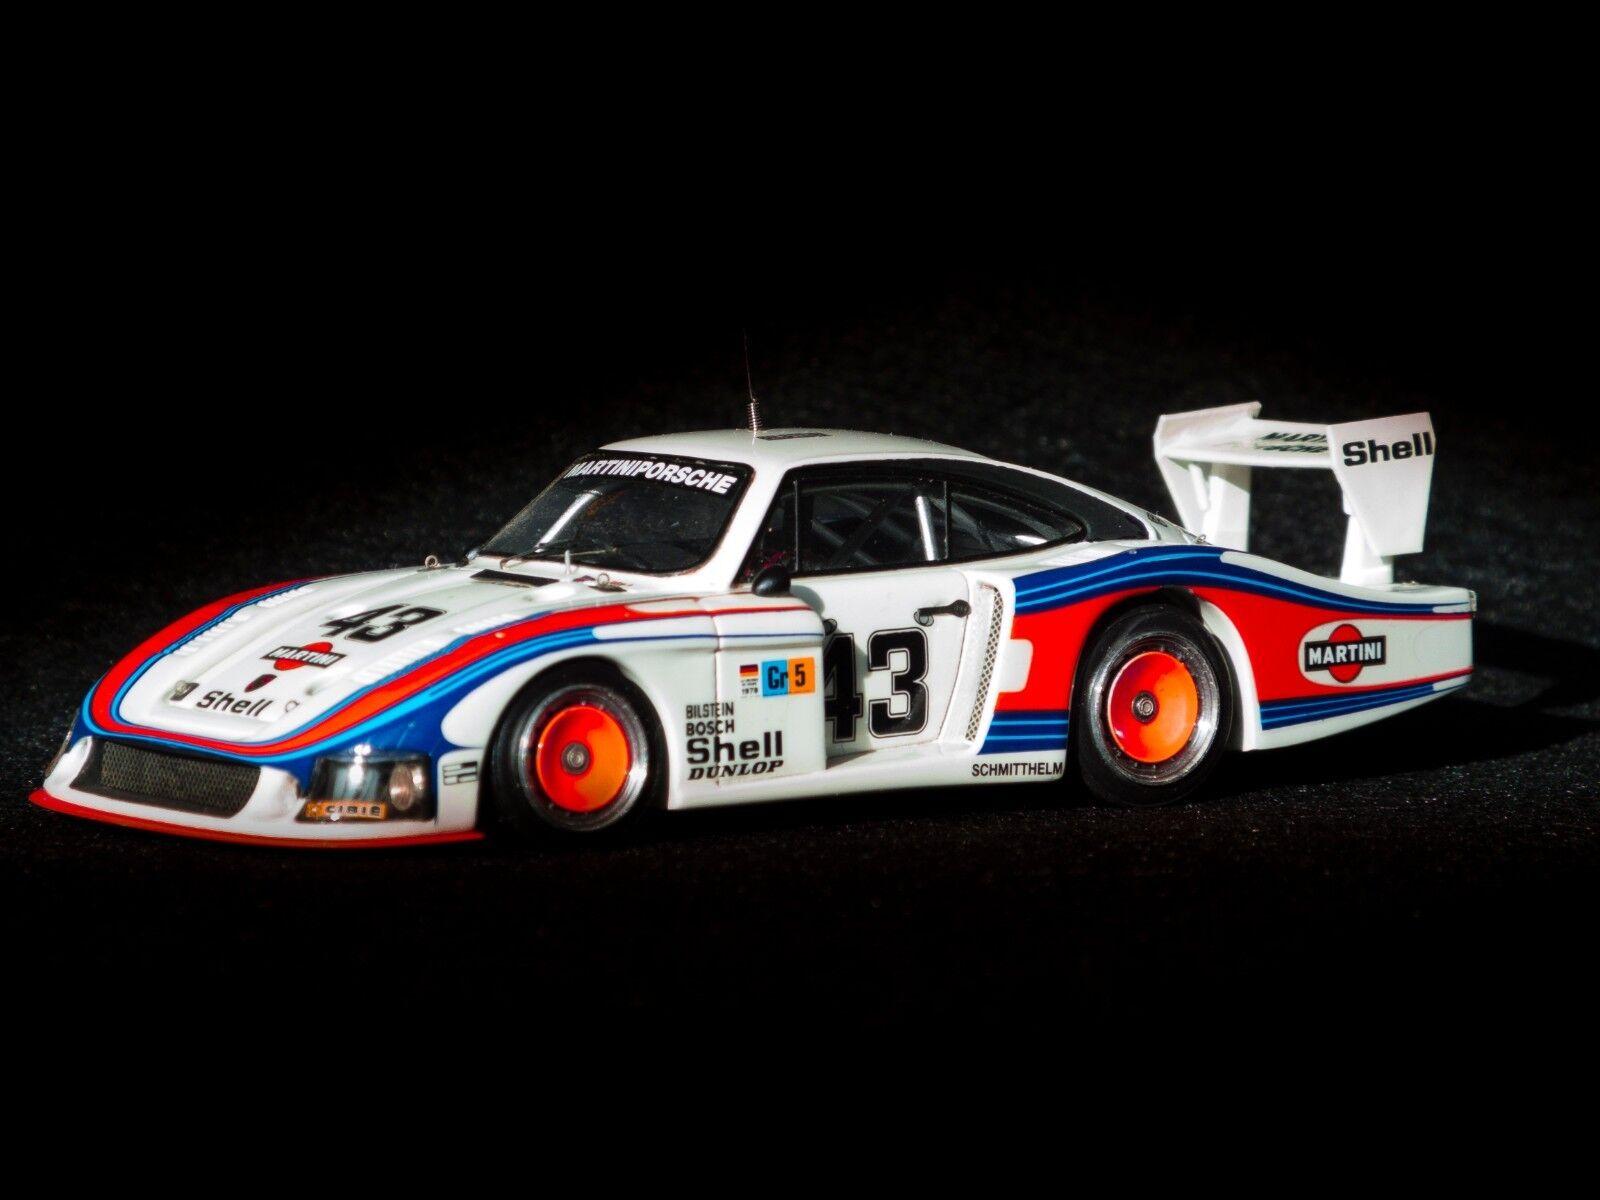 Mr collection Porsche 935 Moby dick Martini  Le mans 1978 1 43 no AMR Spark